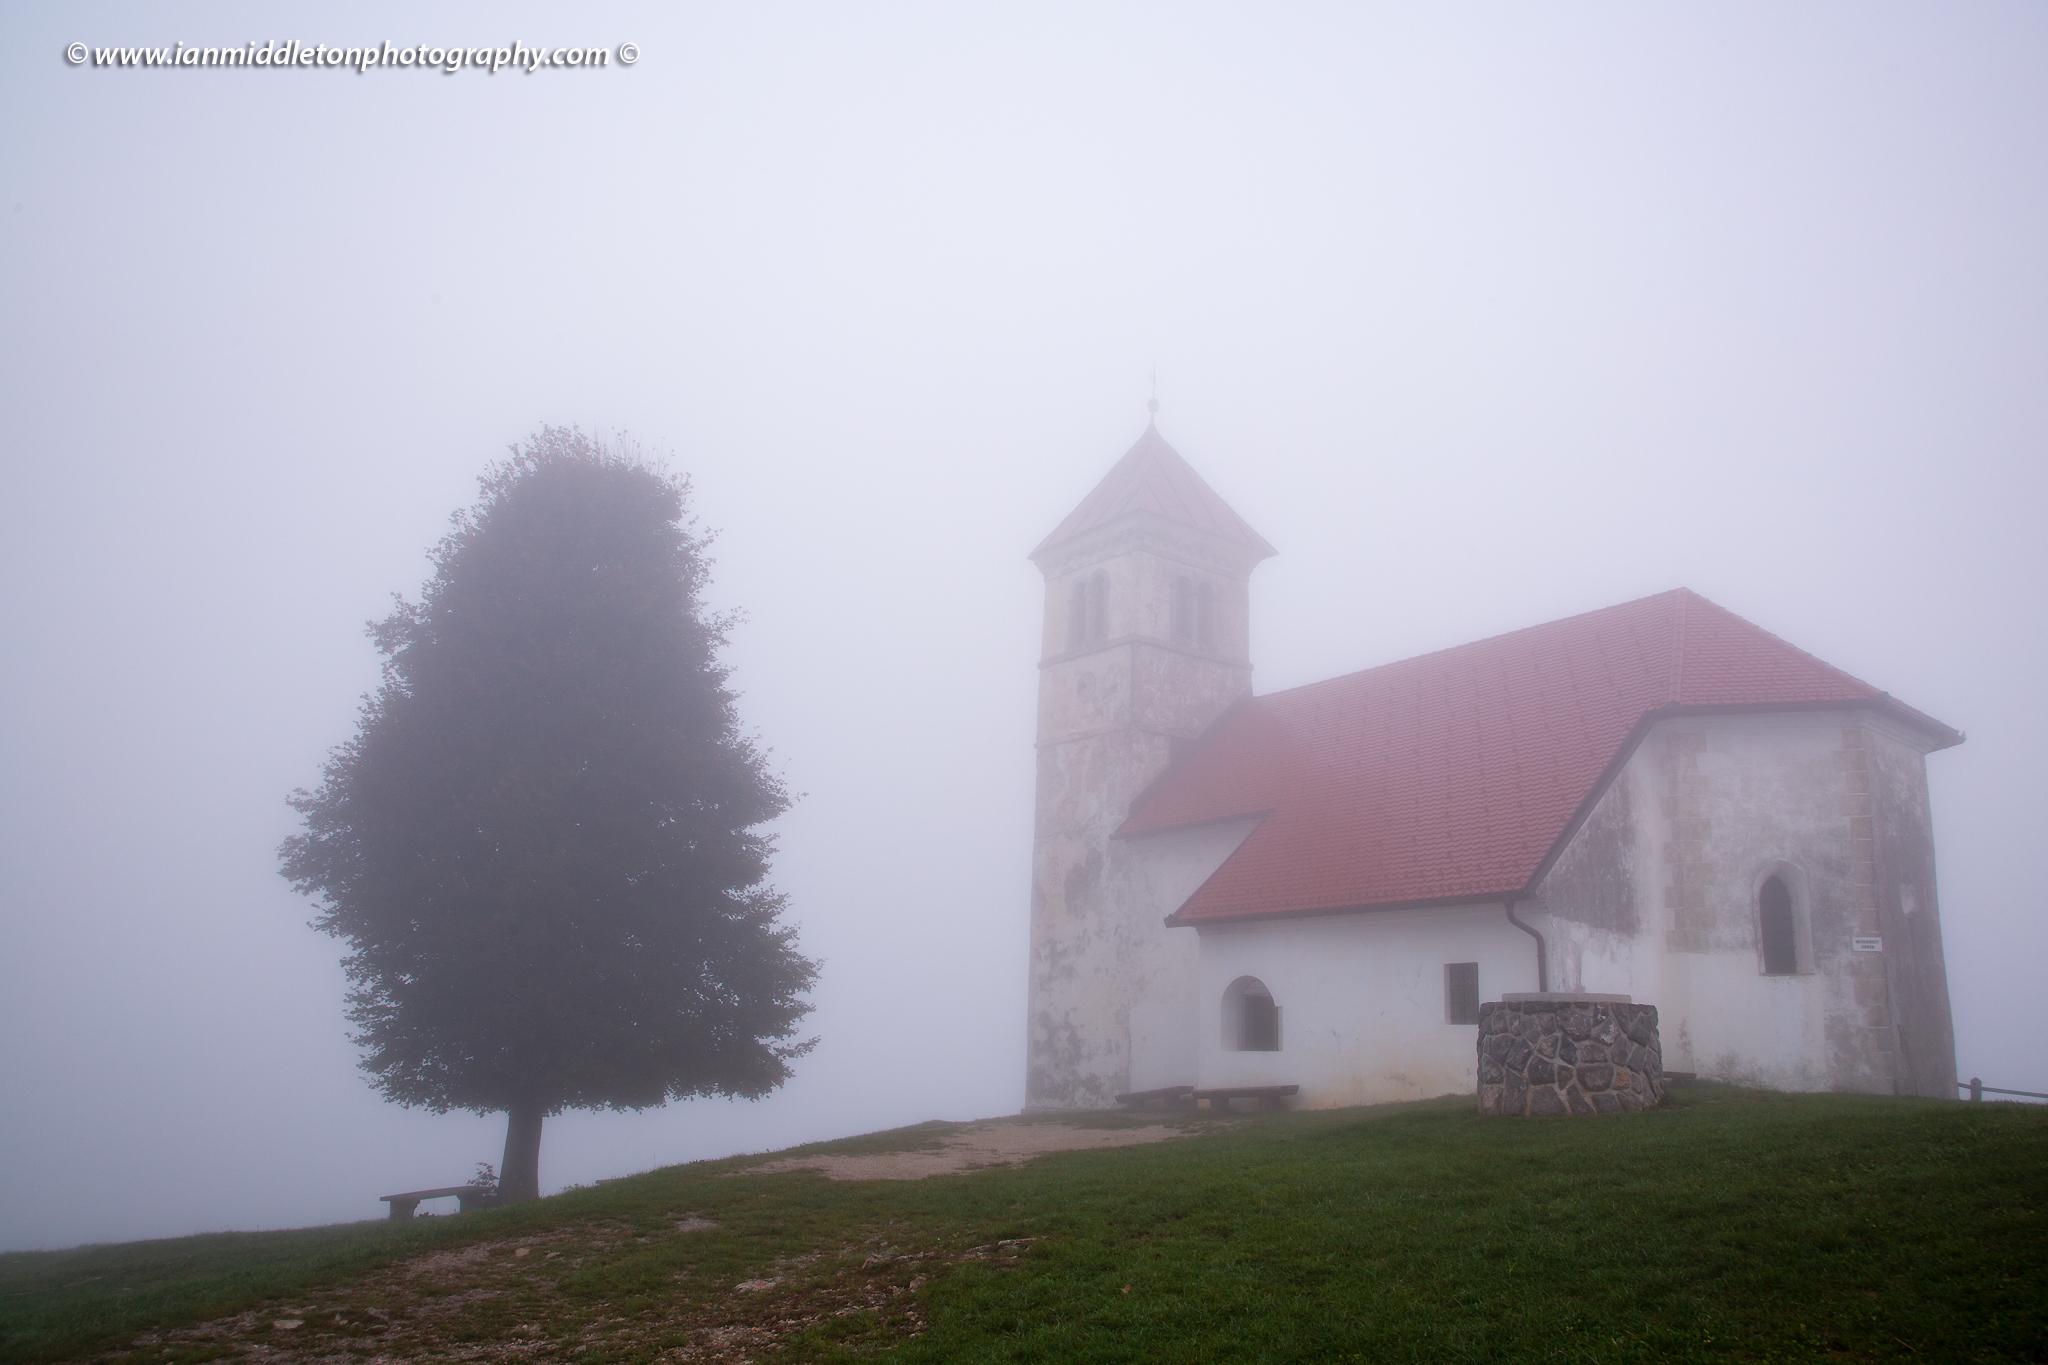 The church of Saint Anna (Sveta Ana). Sveta Ana is perched upon an exposed hill overlooking the Ljubljansko Barje (Ljubljana moors) near the village of Preserje.